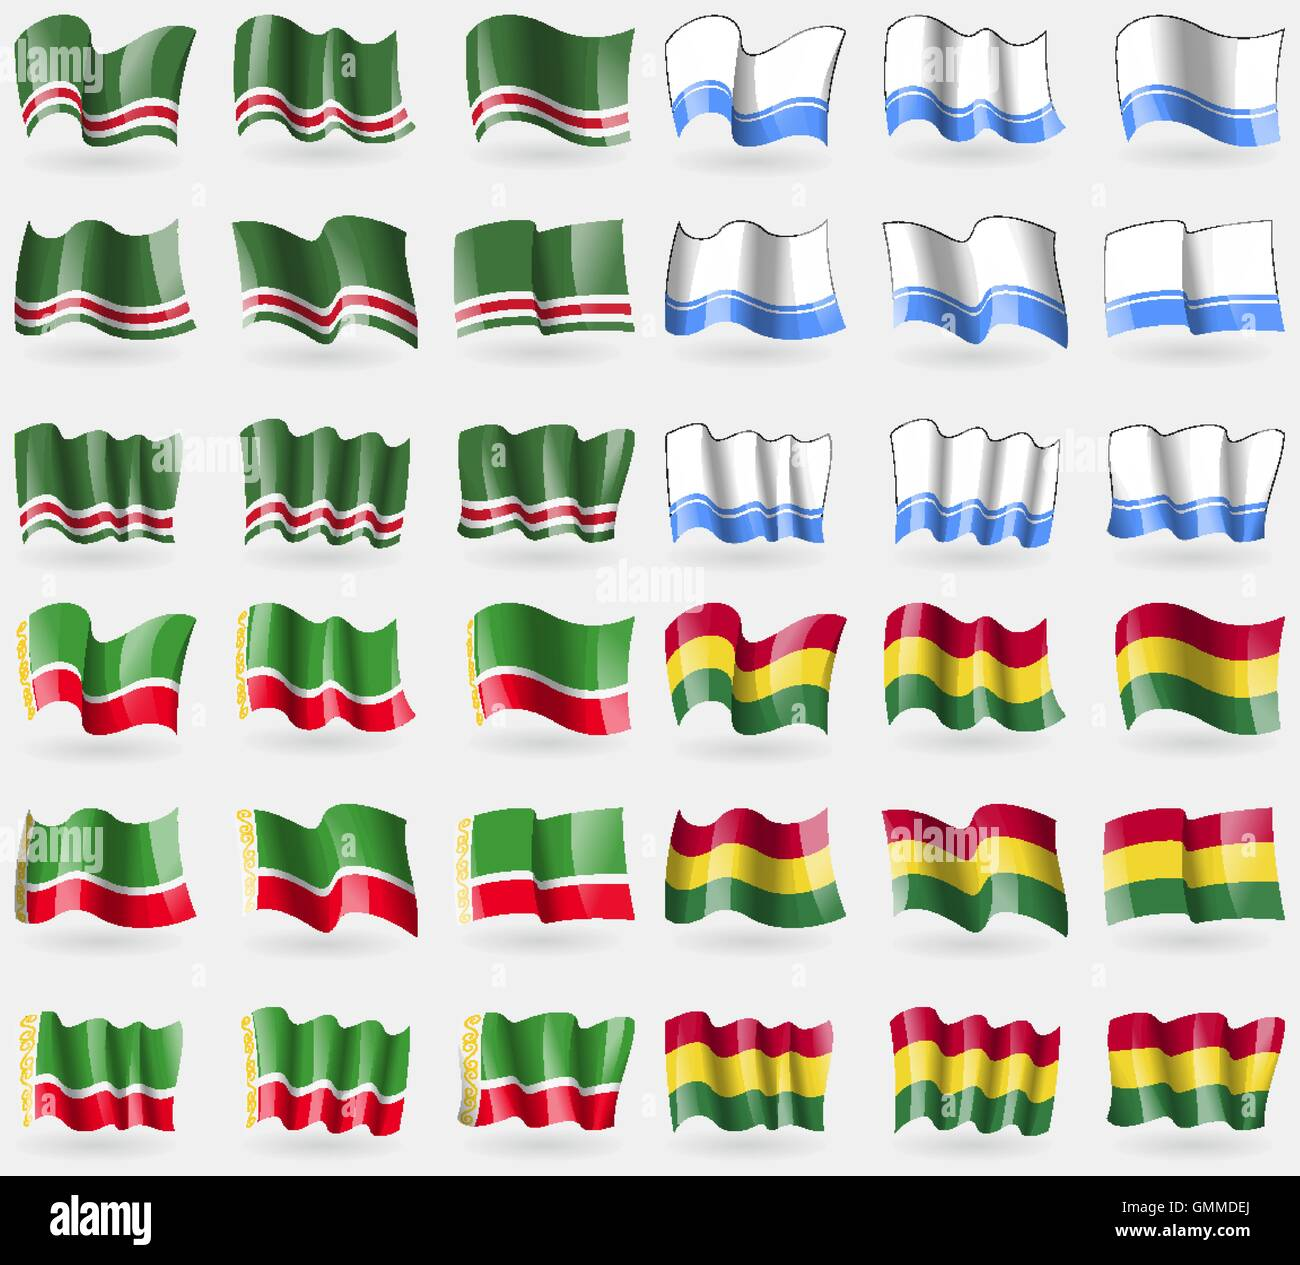 Chechen Republic of Ichkeria, Altai Republic, Chechen Republic, Bolivia. Set of 36 flags of the countries of the - Stock Image